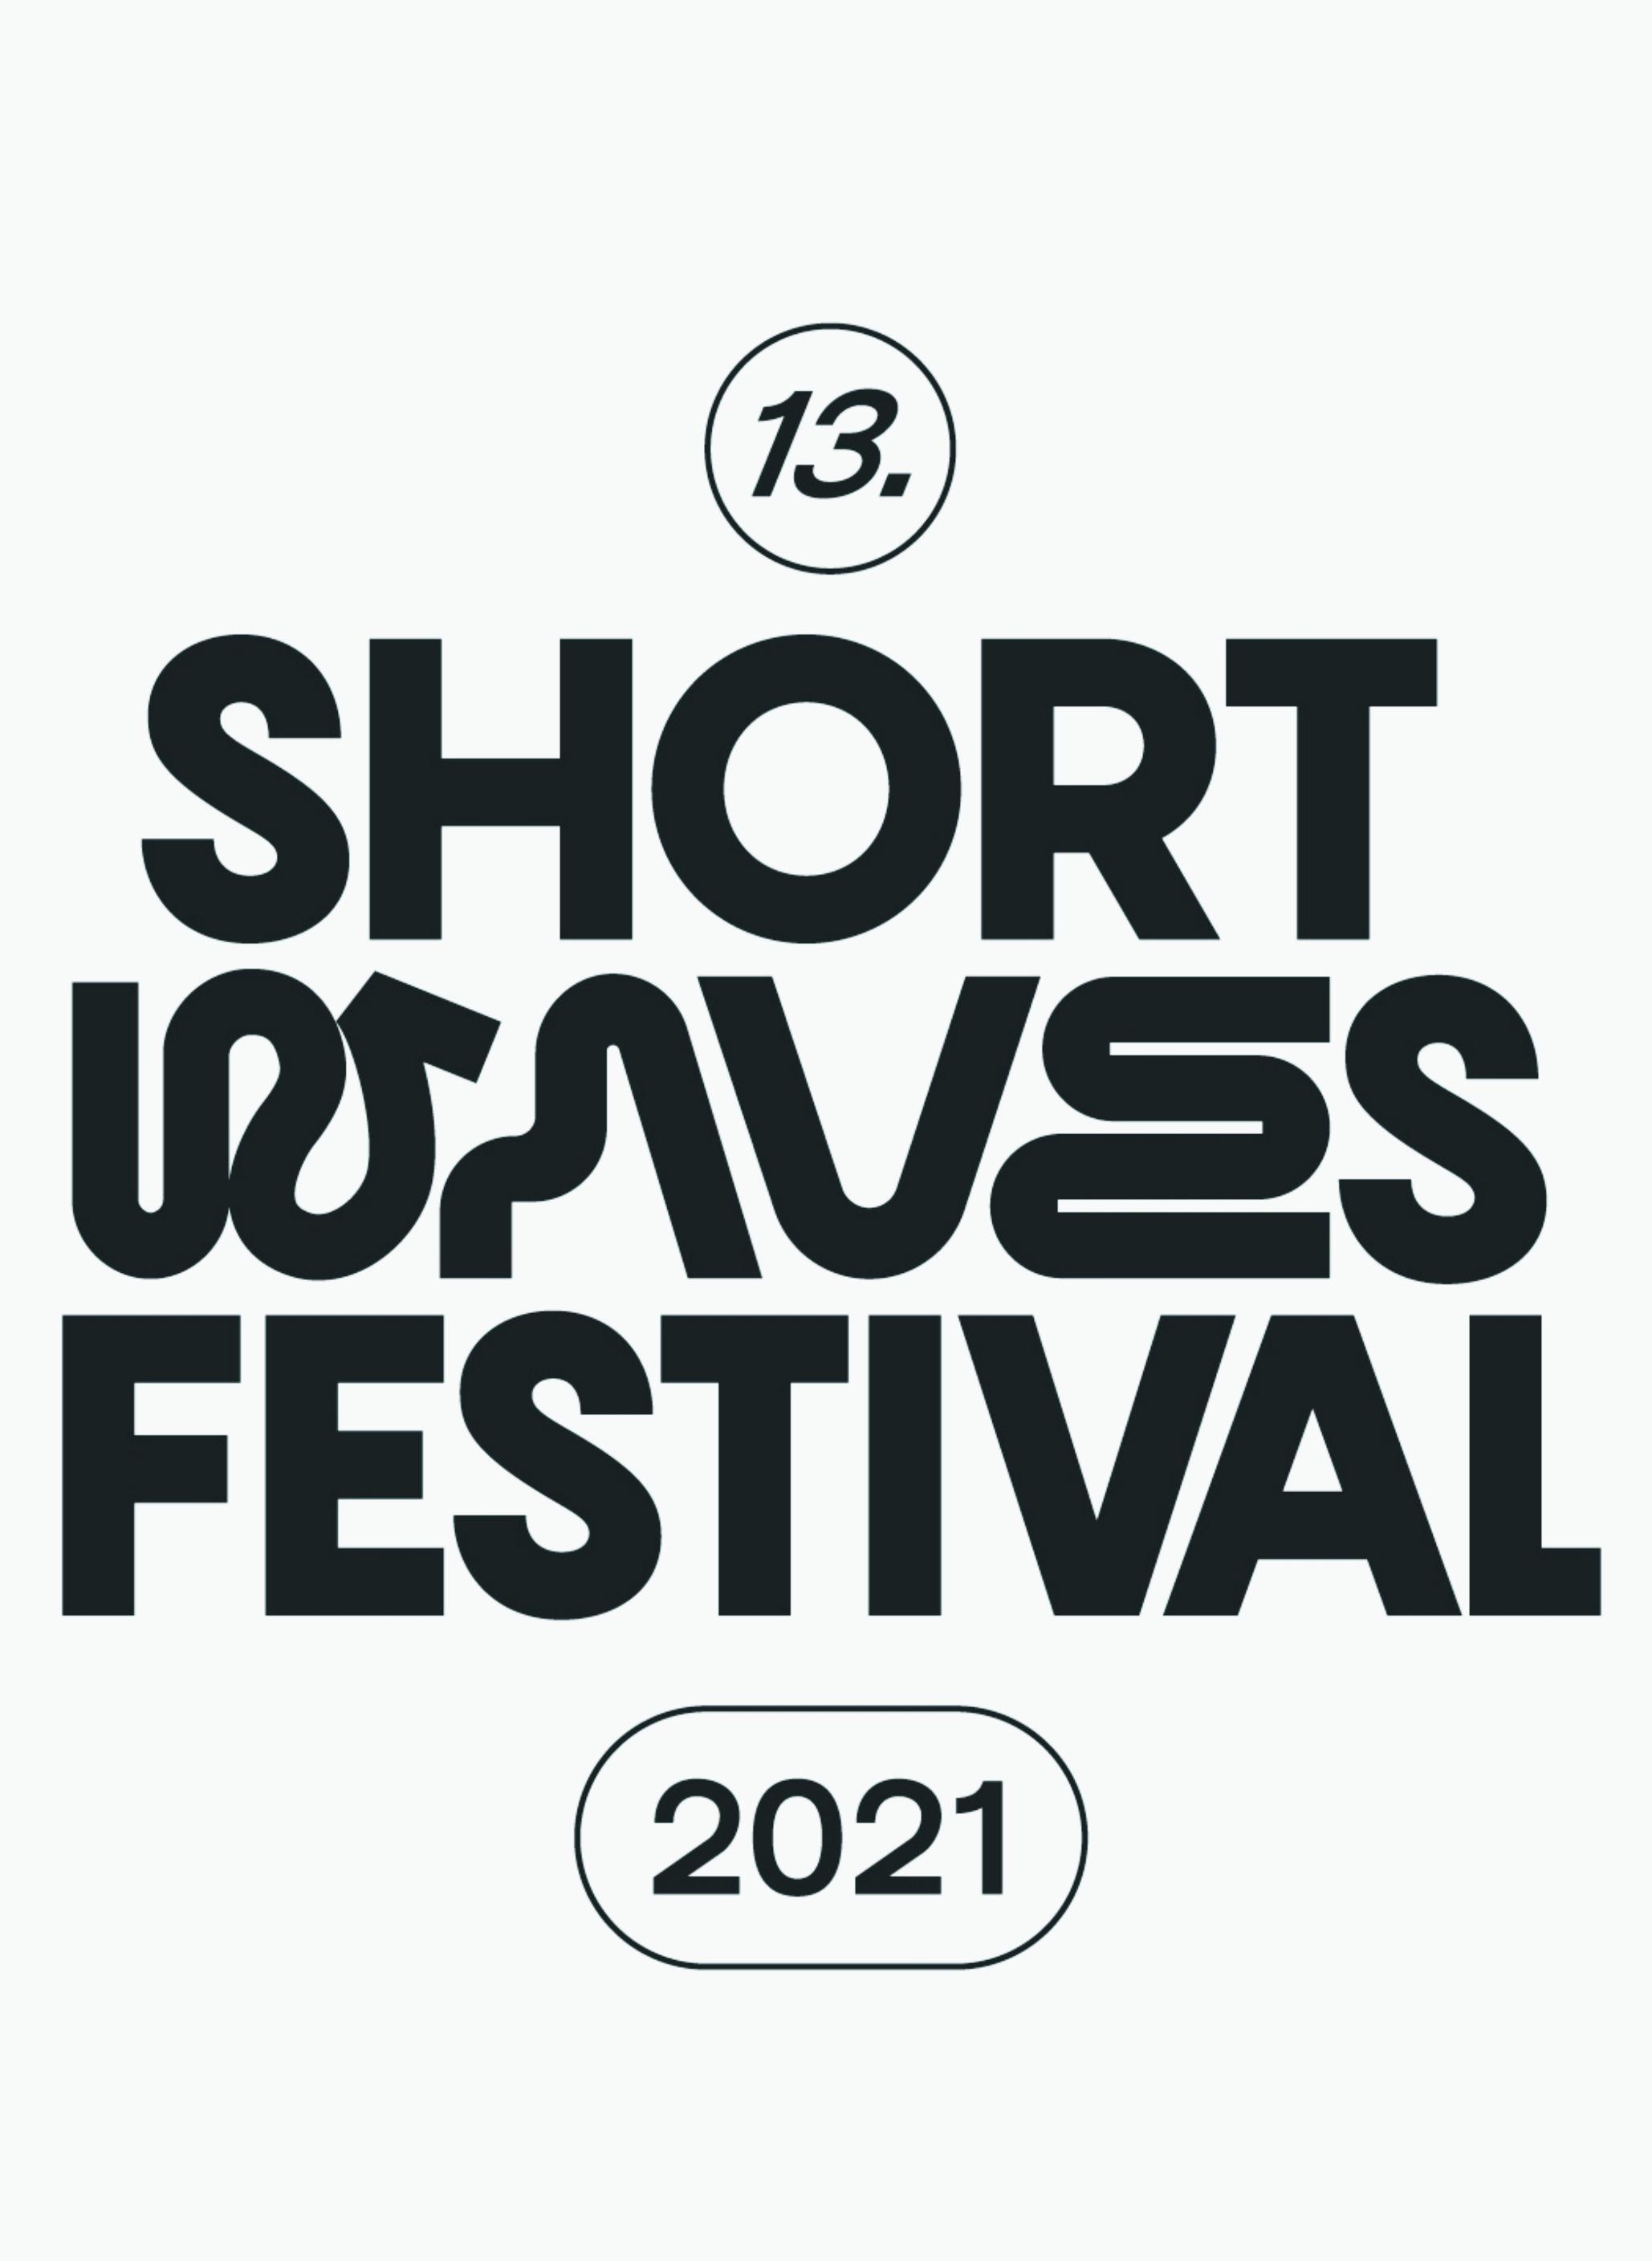 Short Waves Festival 2021 - Europejskie Nagrody Filmowe II